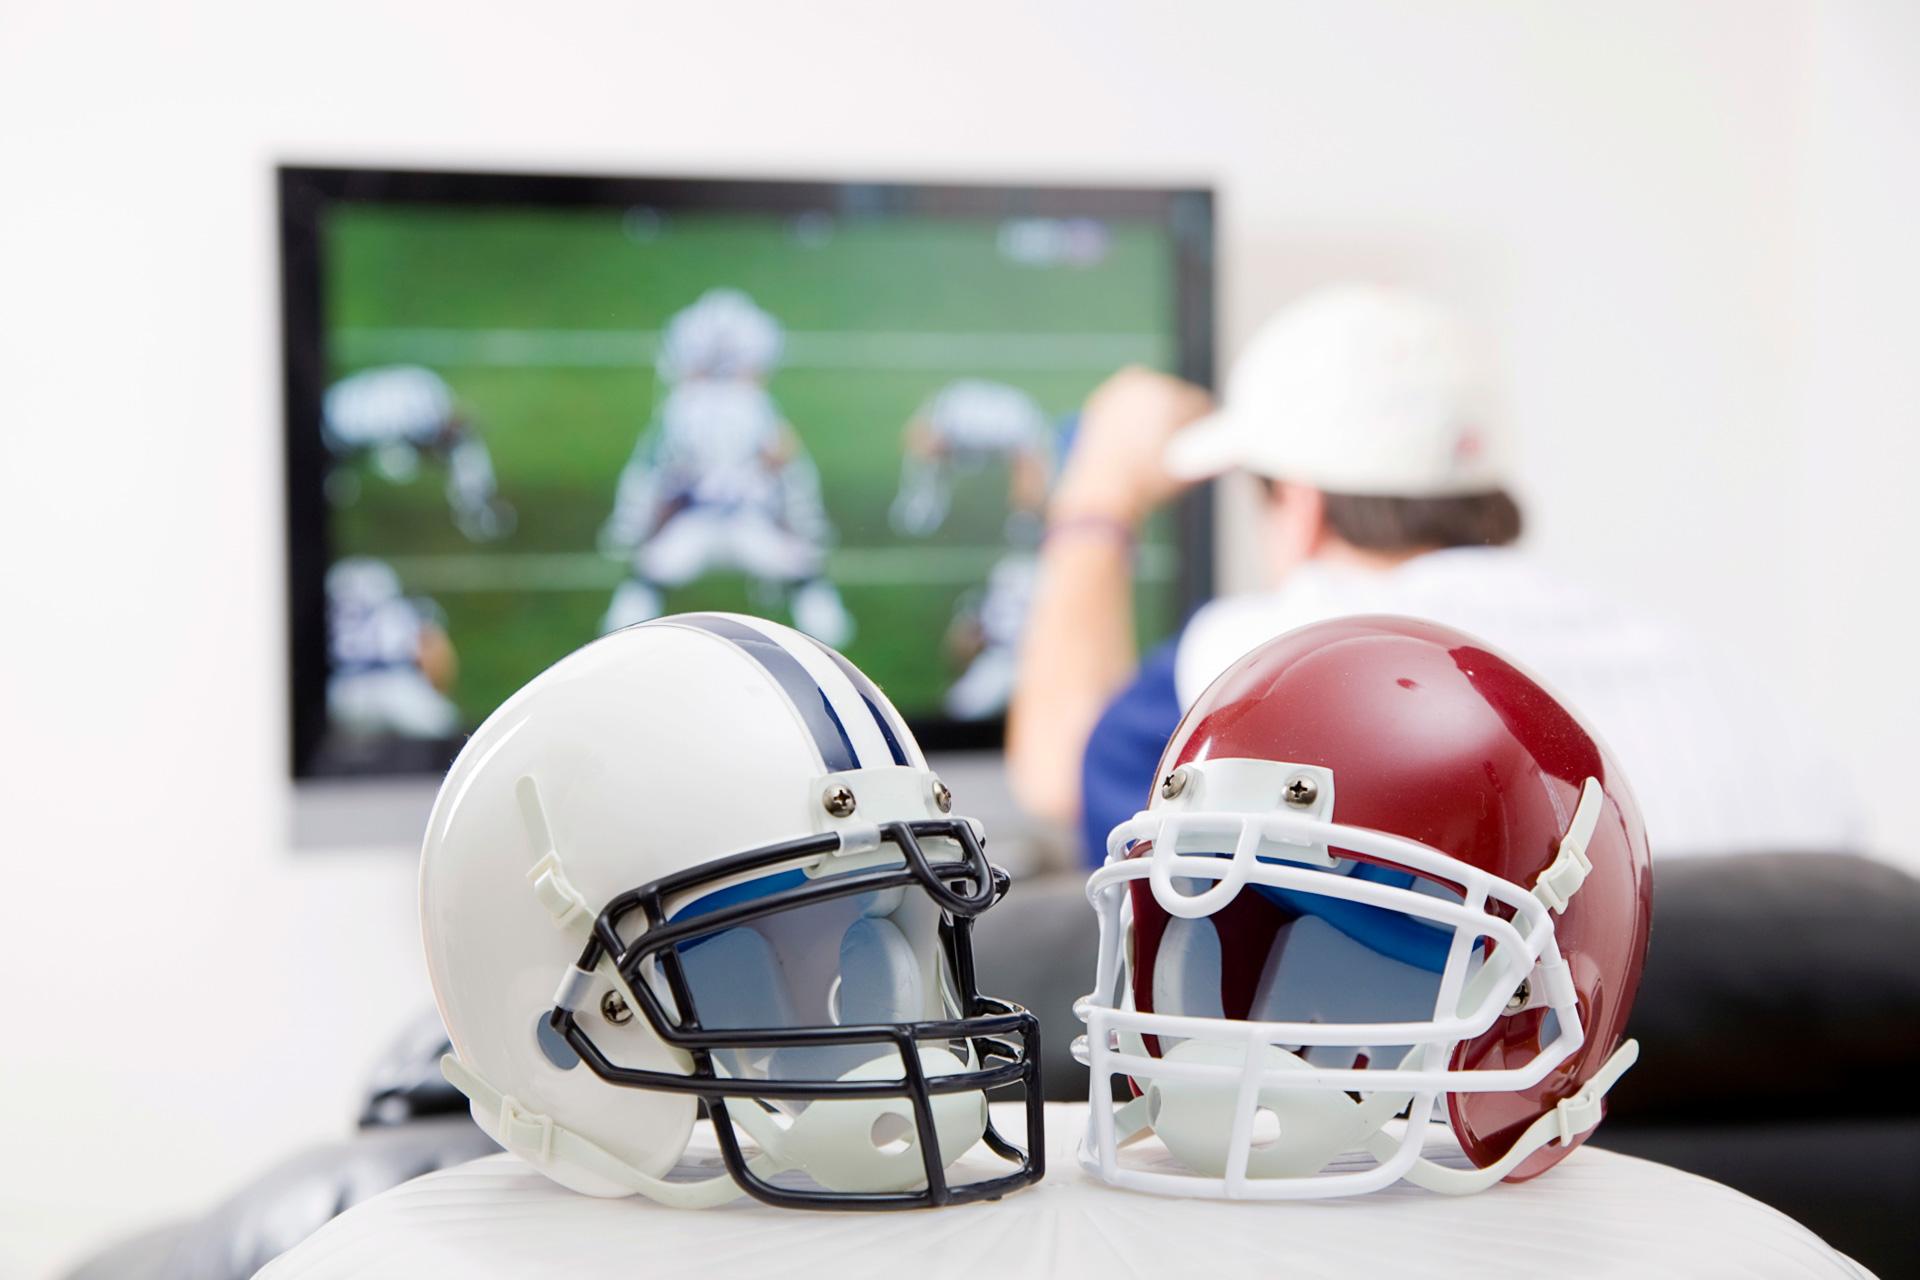 Premium sports channels